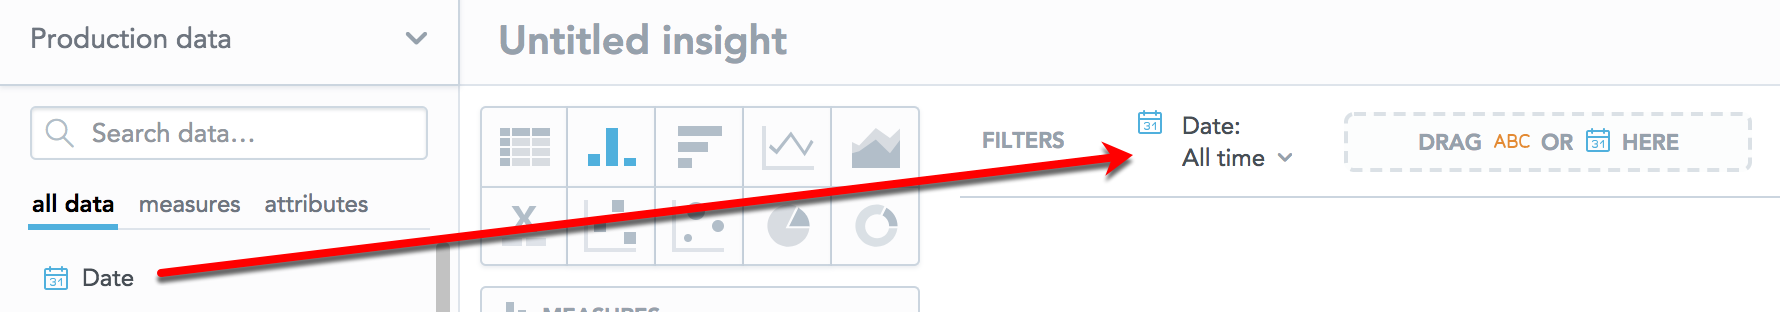 compare date filter